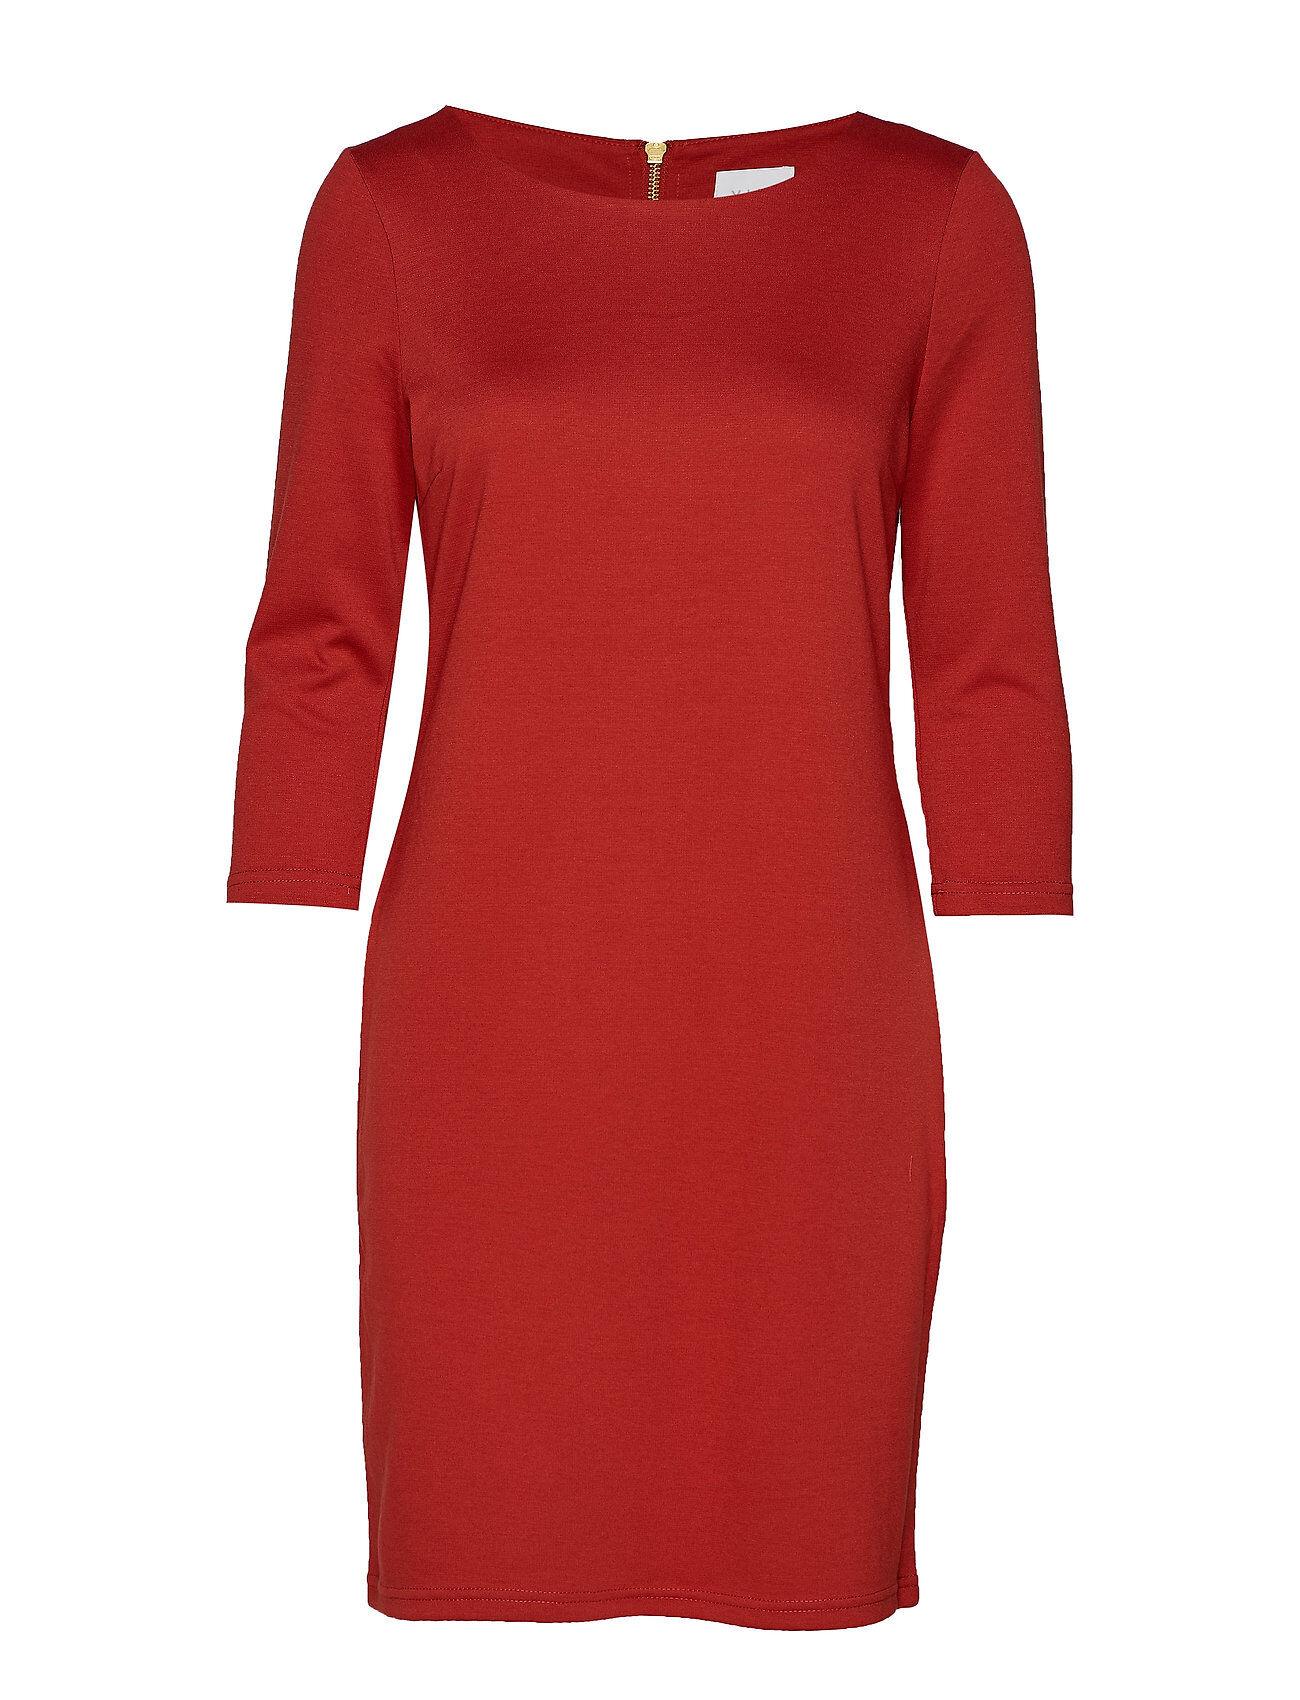 Image of VILA Vitinny New Dress-Noos Mekko Punainen VILA